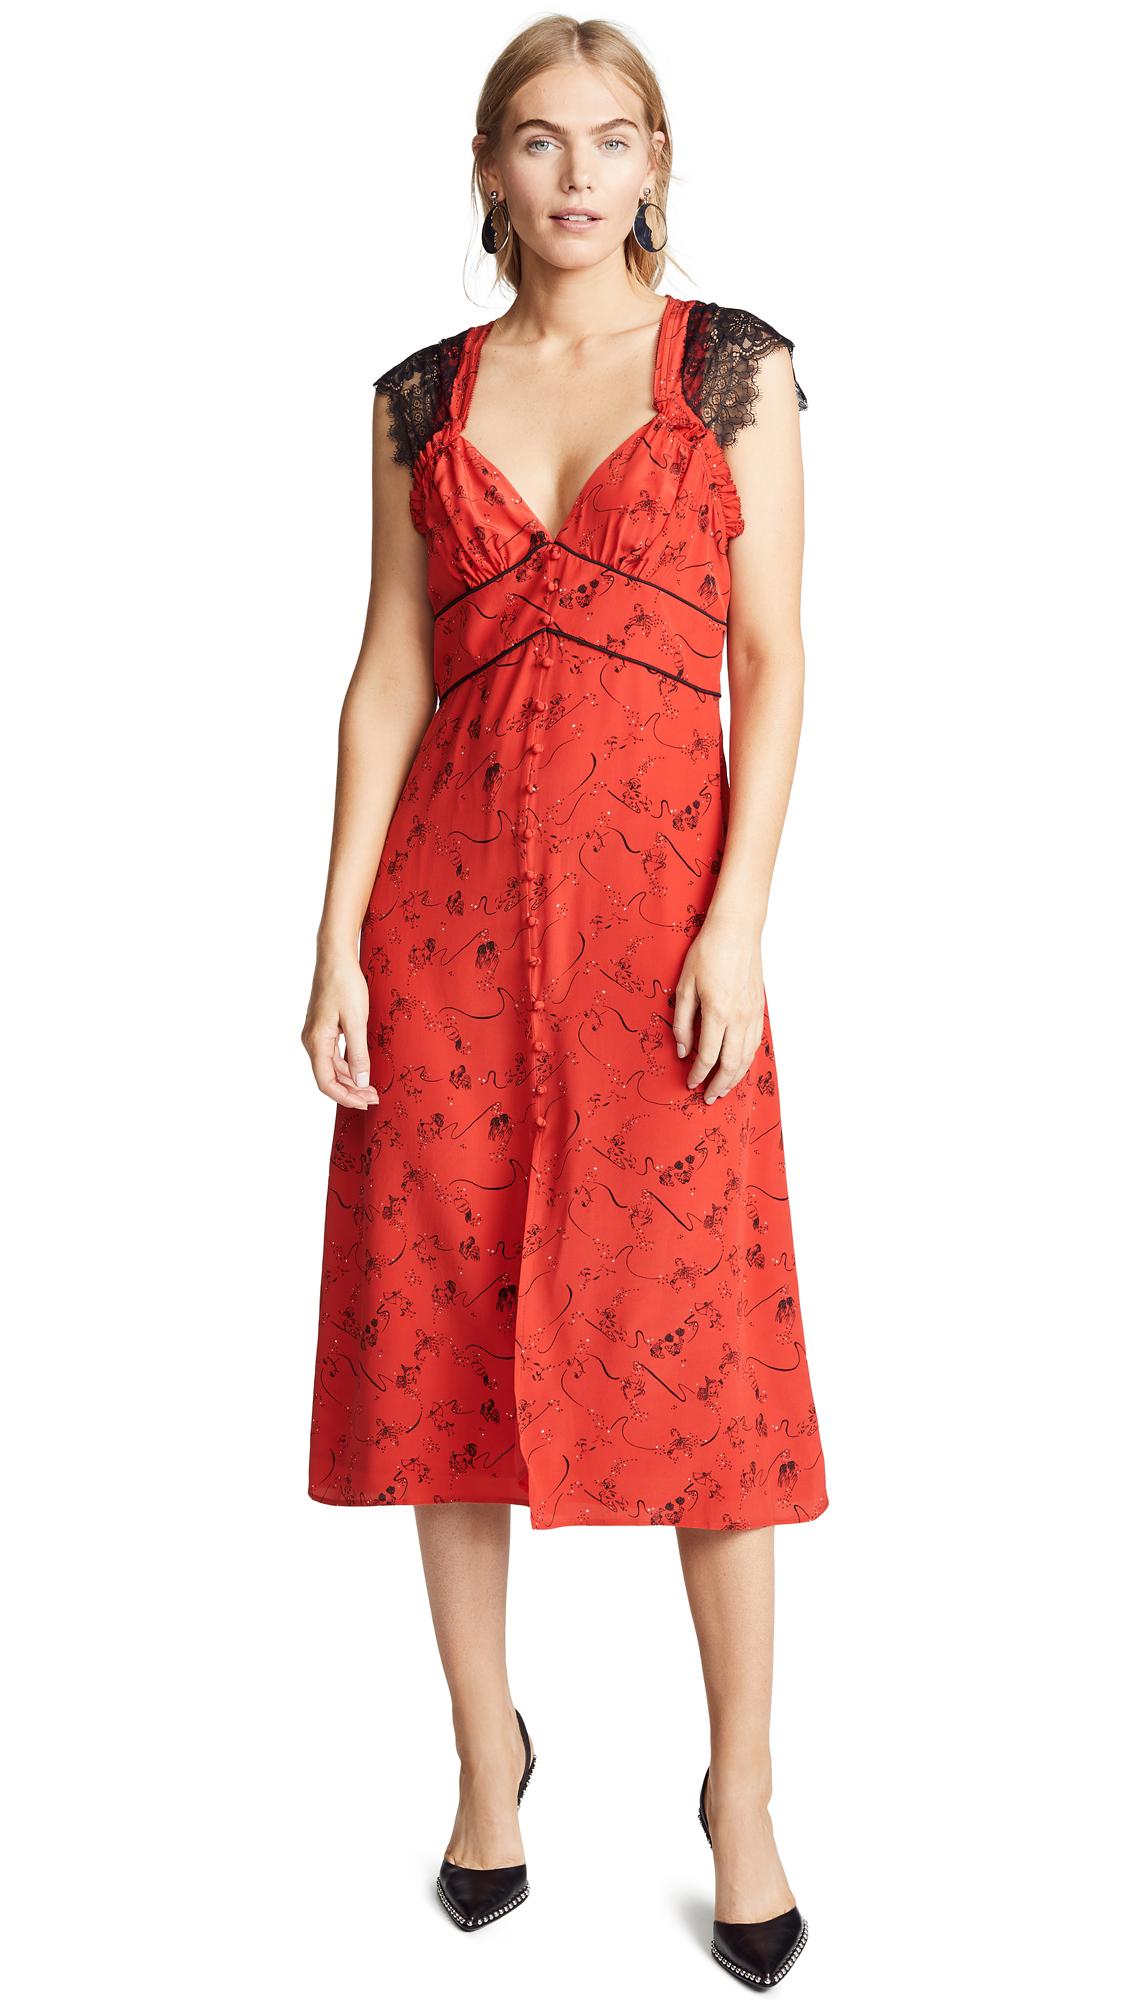 Tanya Taylor Kara Dress